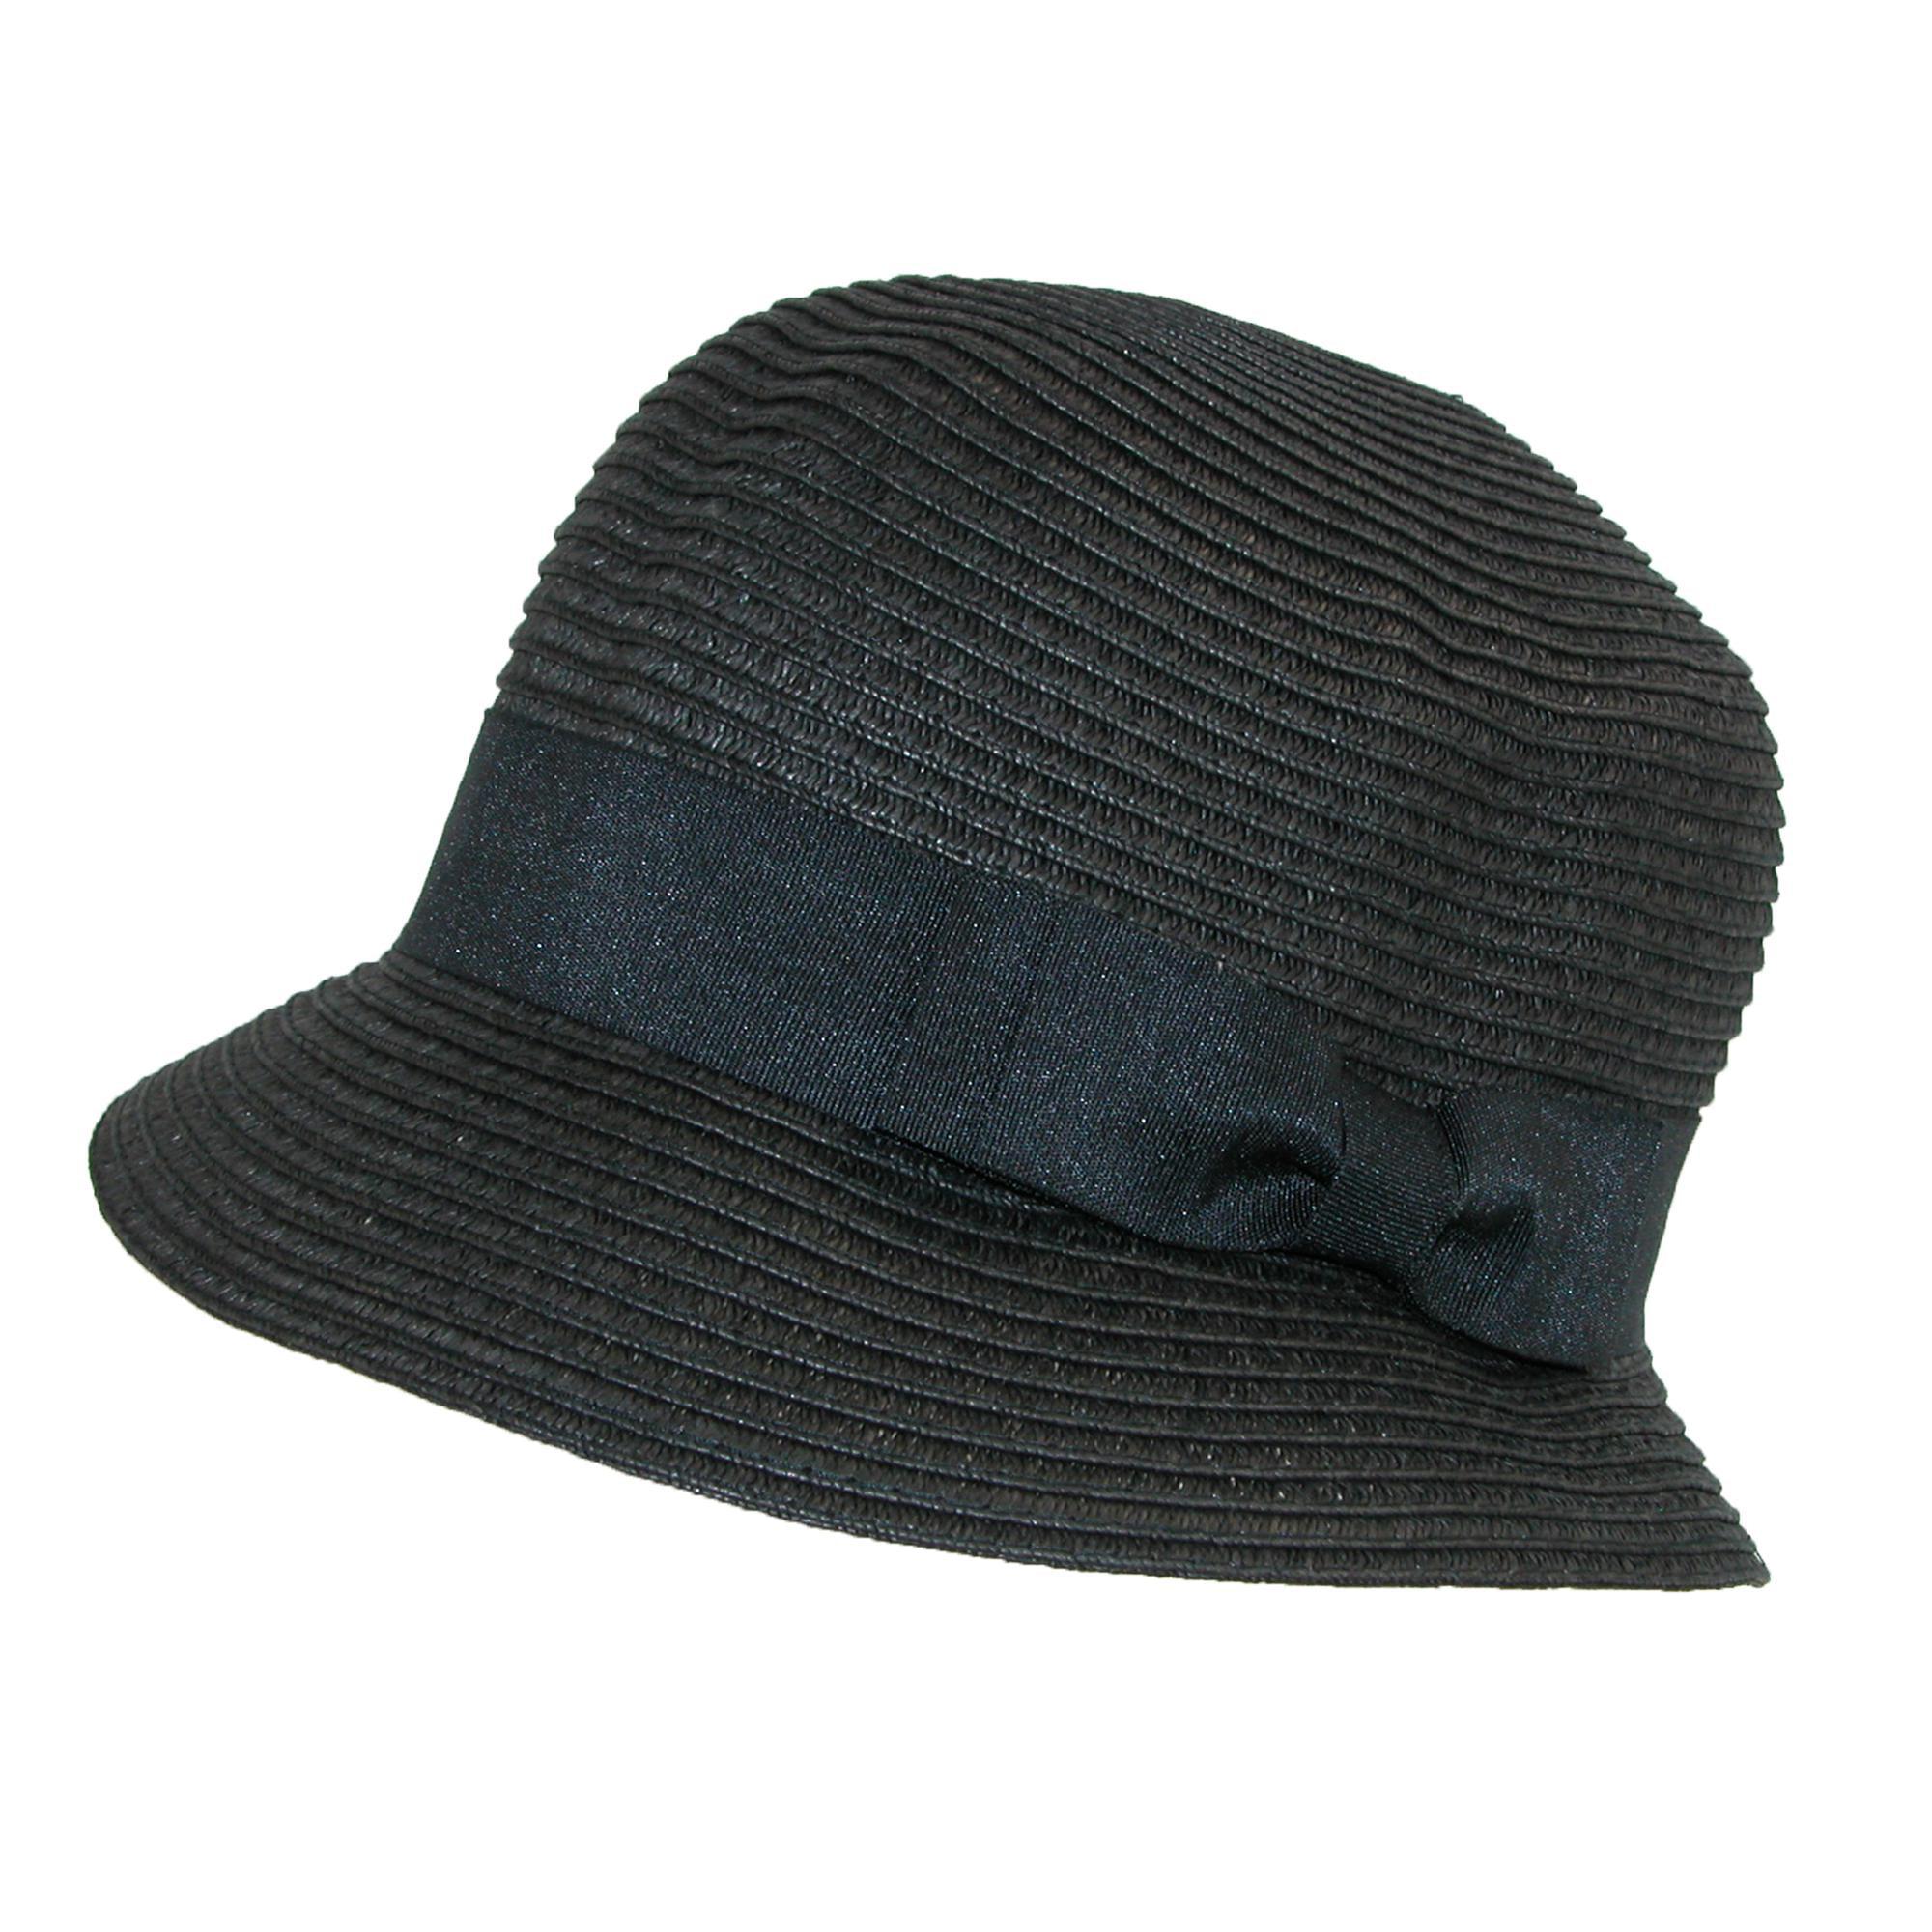 Jeanne Simmons Women s Paper Braided Summer Sun Cloche Hat 9fdd84def87